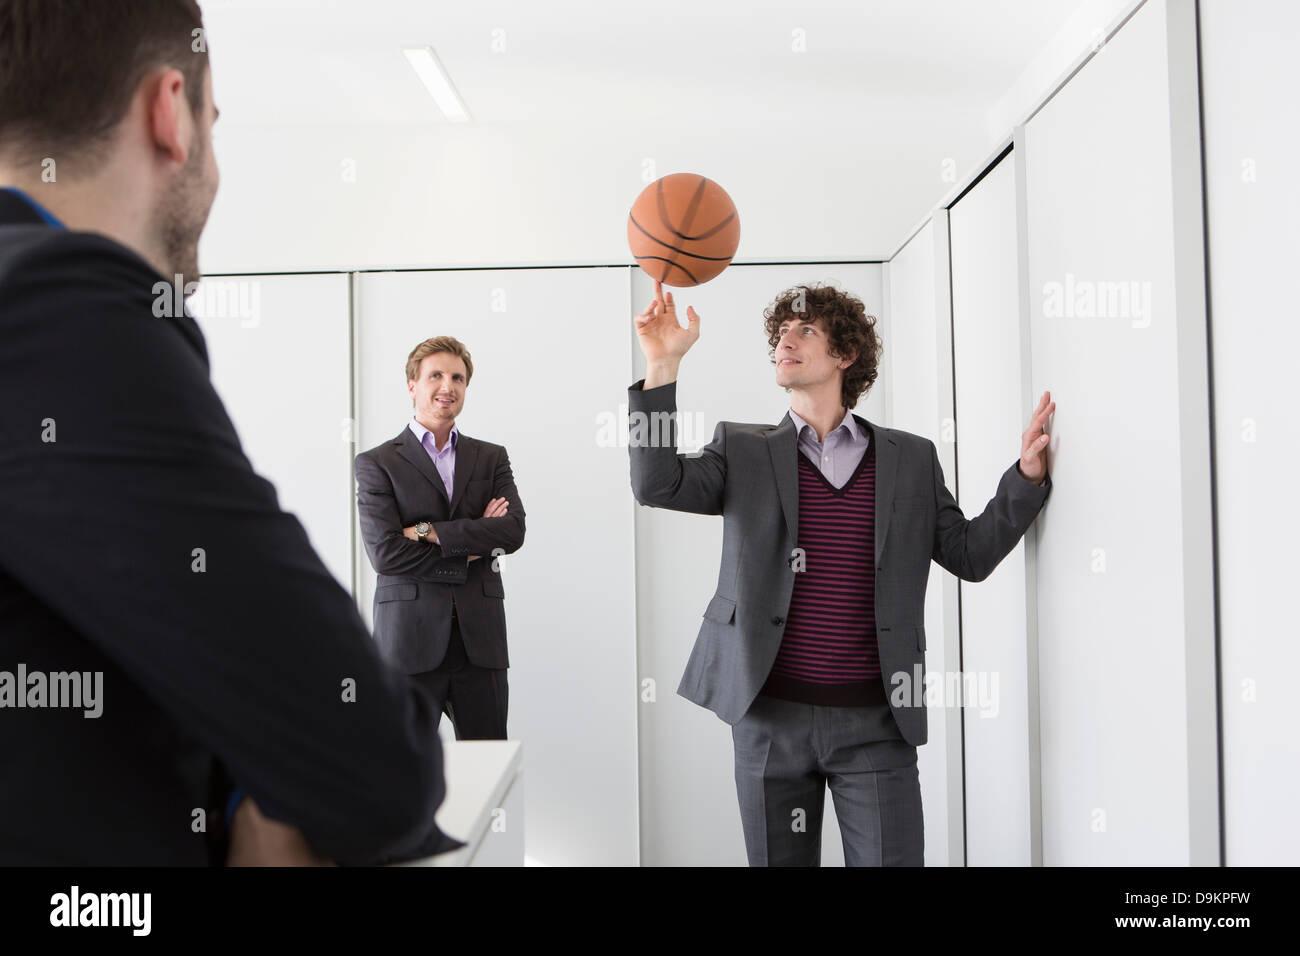 Office worker spinning basketball on finger Photo Stock